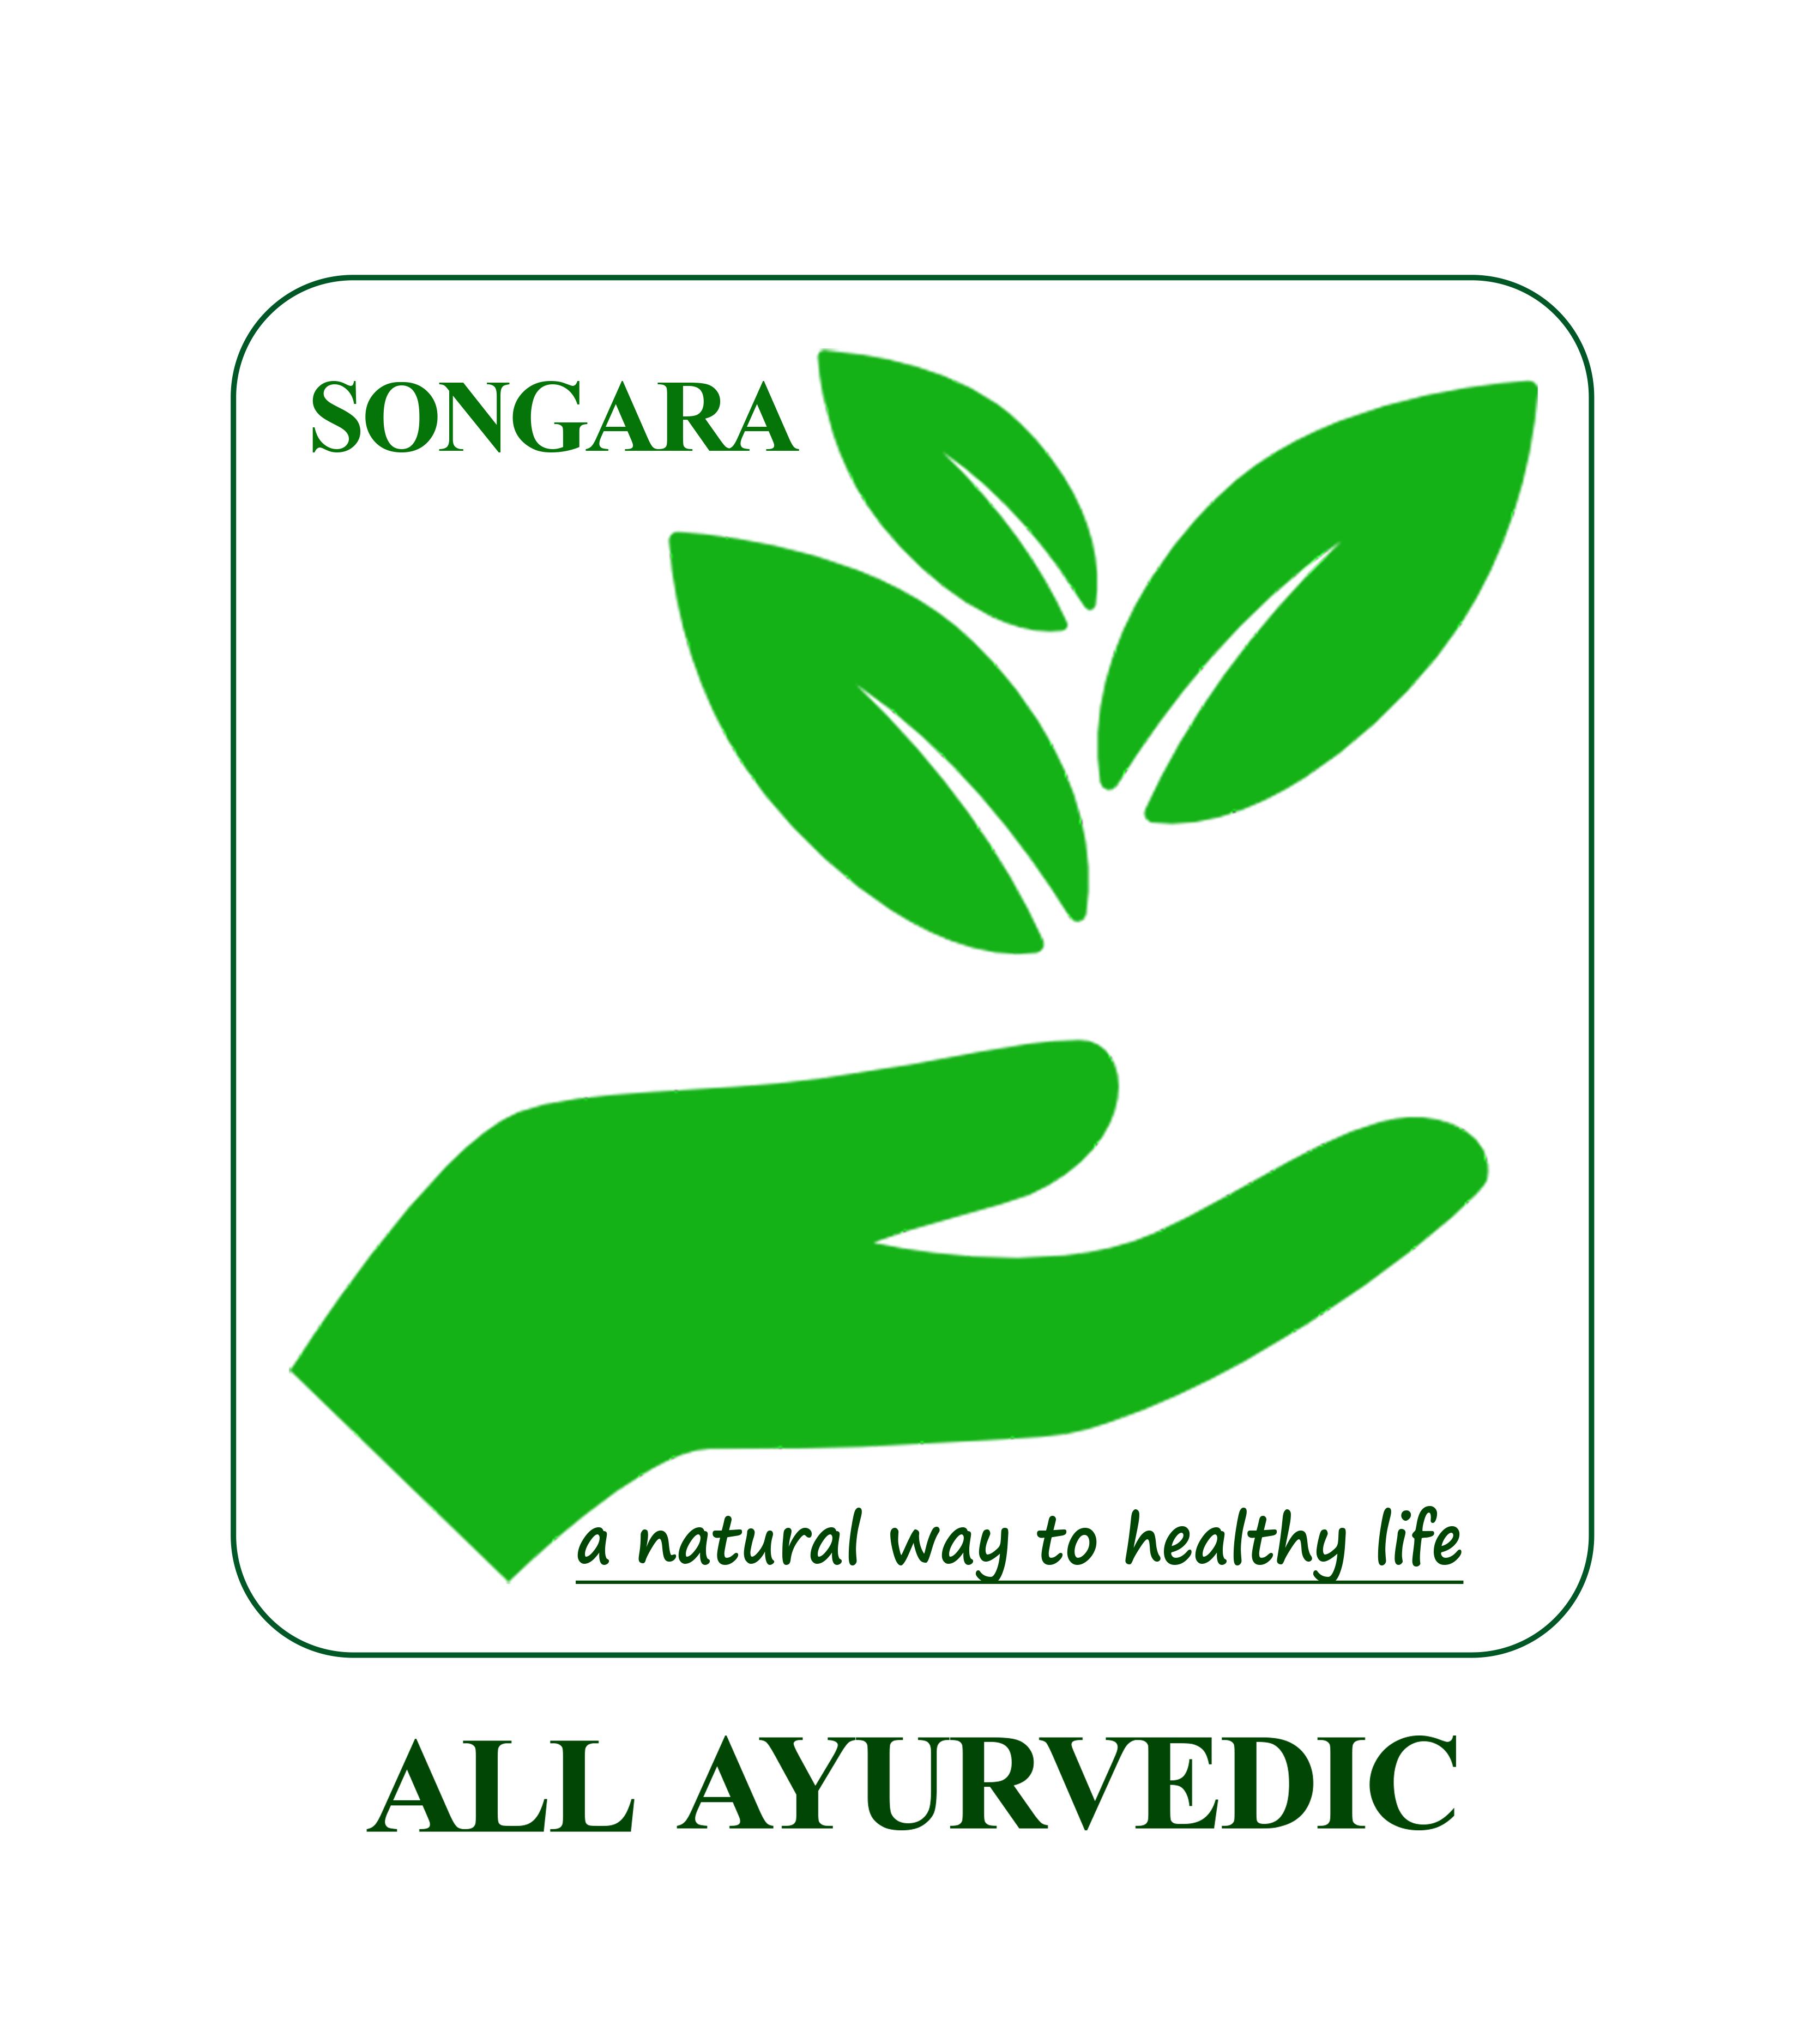 Songara All Ayurvedic